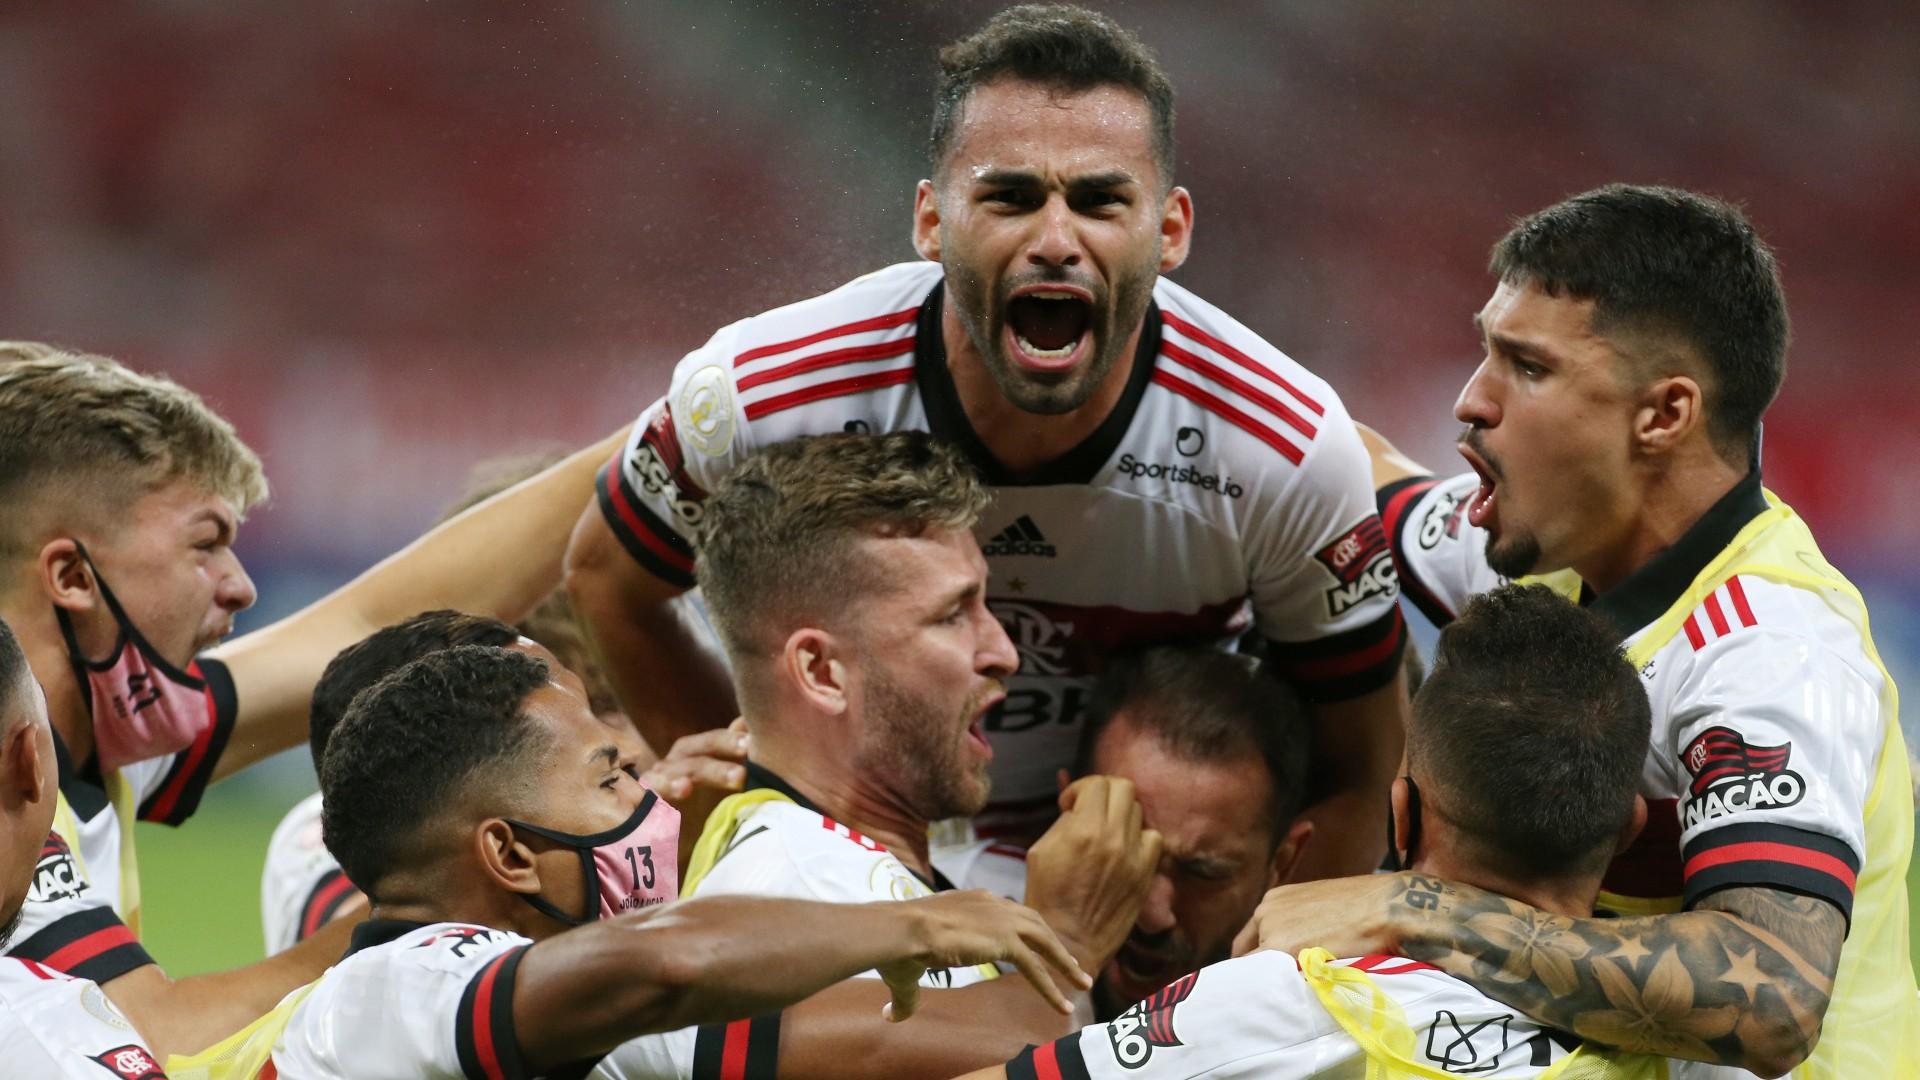 Defanzivci Flamenga častili Internasional s dva gola, ali je Ribeiro u poslednjim trenucima meča doneo bod šampionu